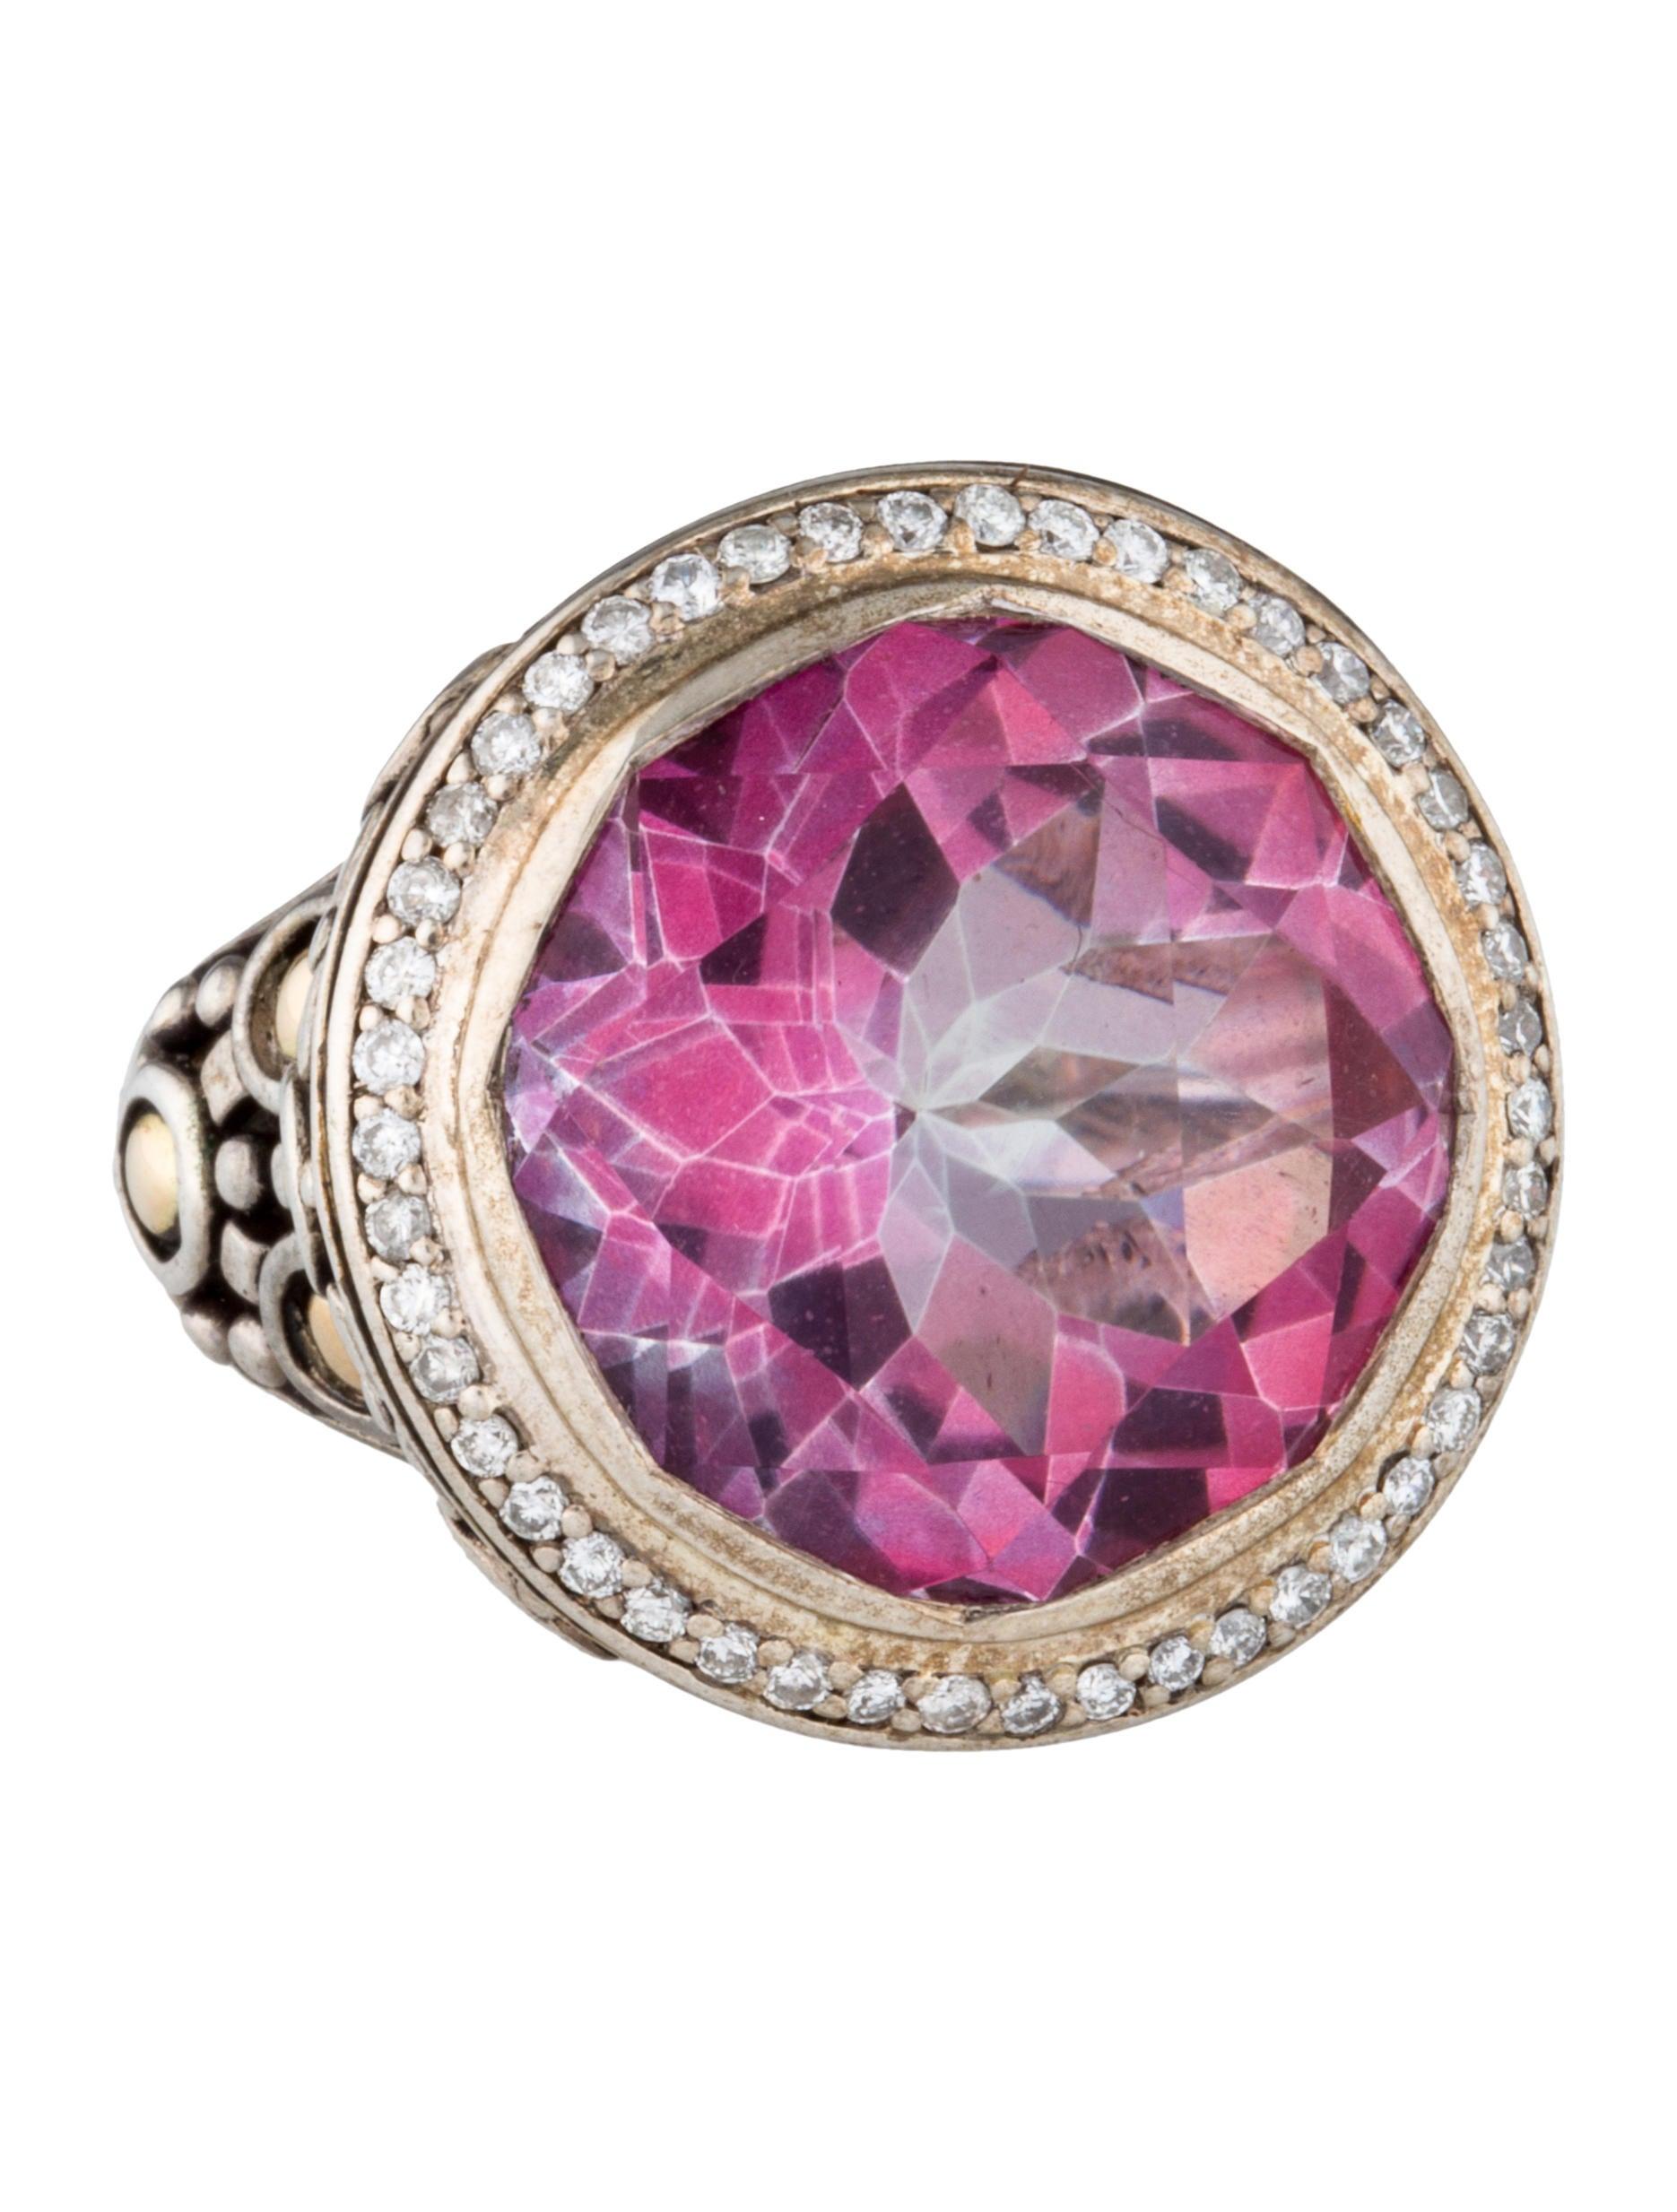 John Hardy Batu Sari Ring - Rings - JHA21967 | The RealReal